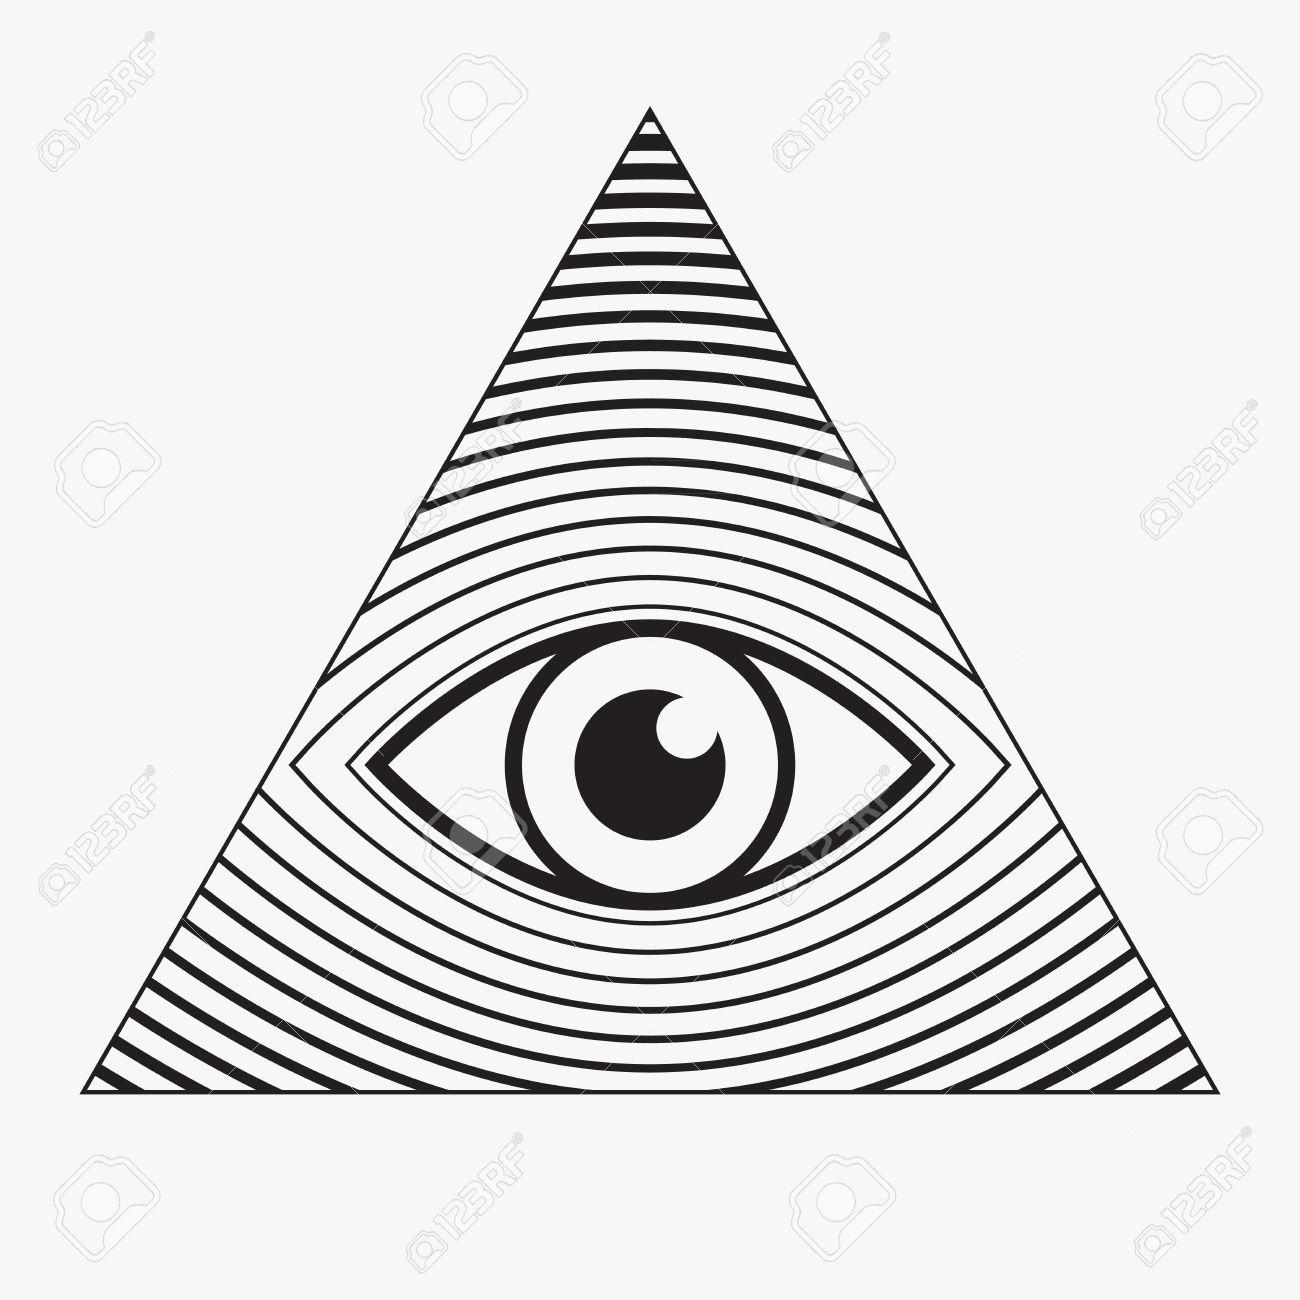 2,419 God S Eye Stock Vector Illustration And Royalty Free God S.